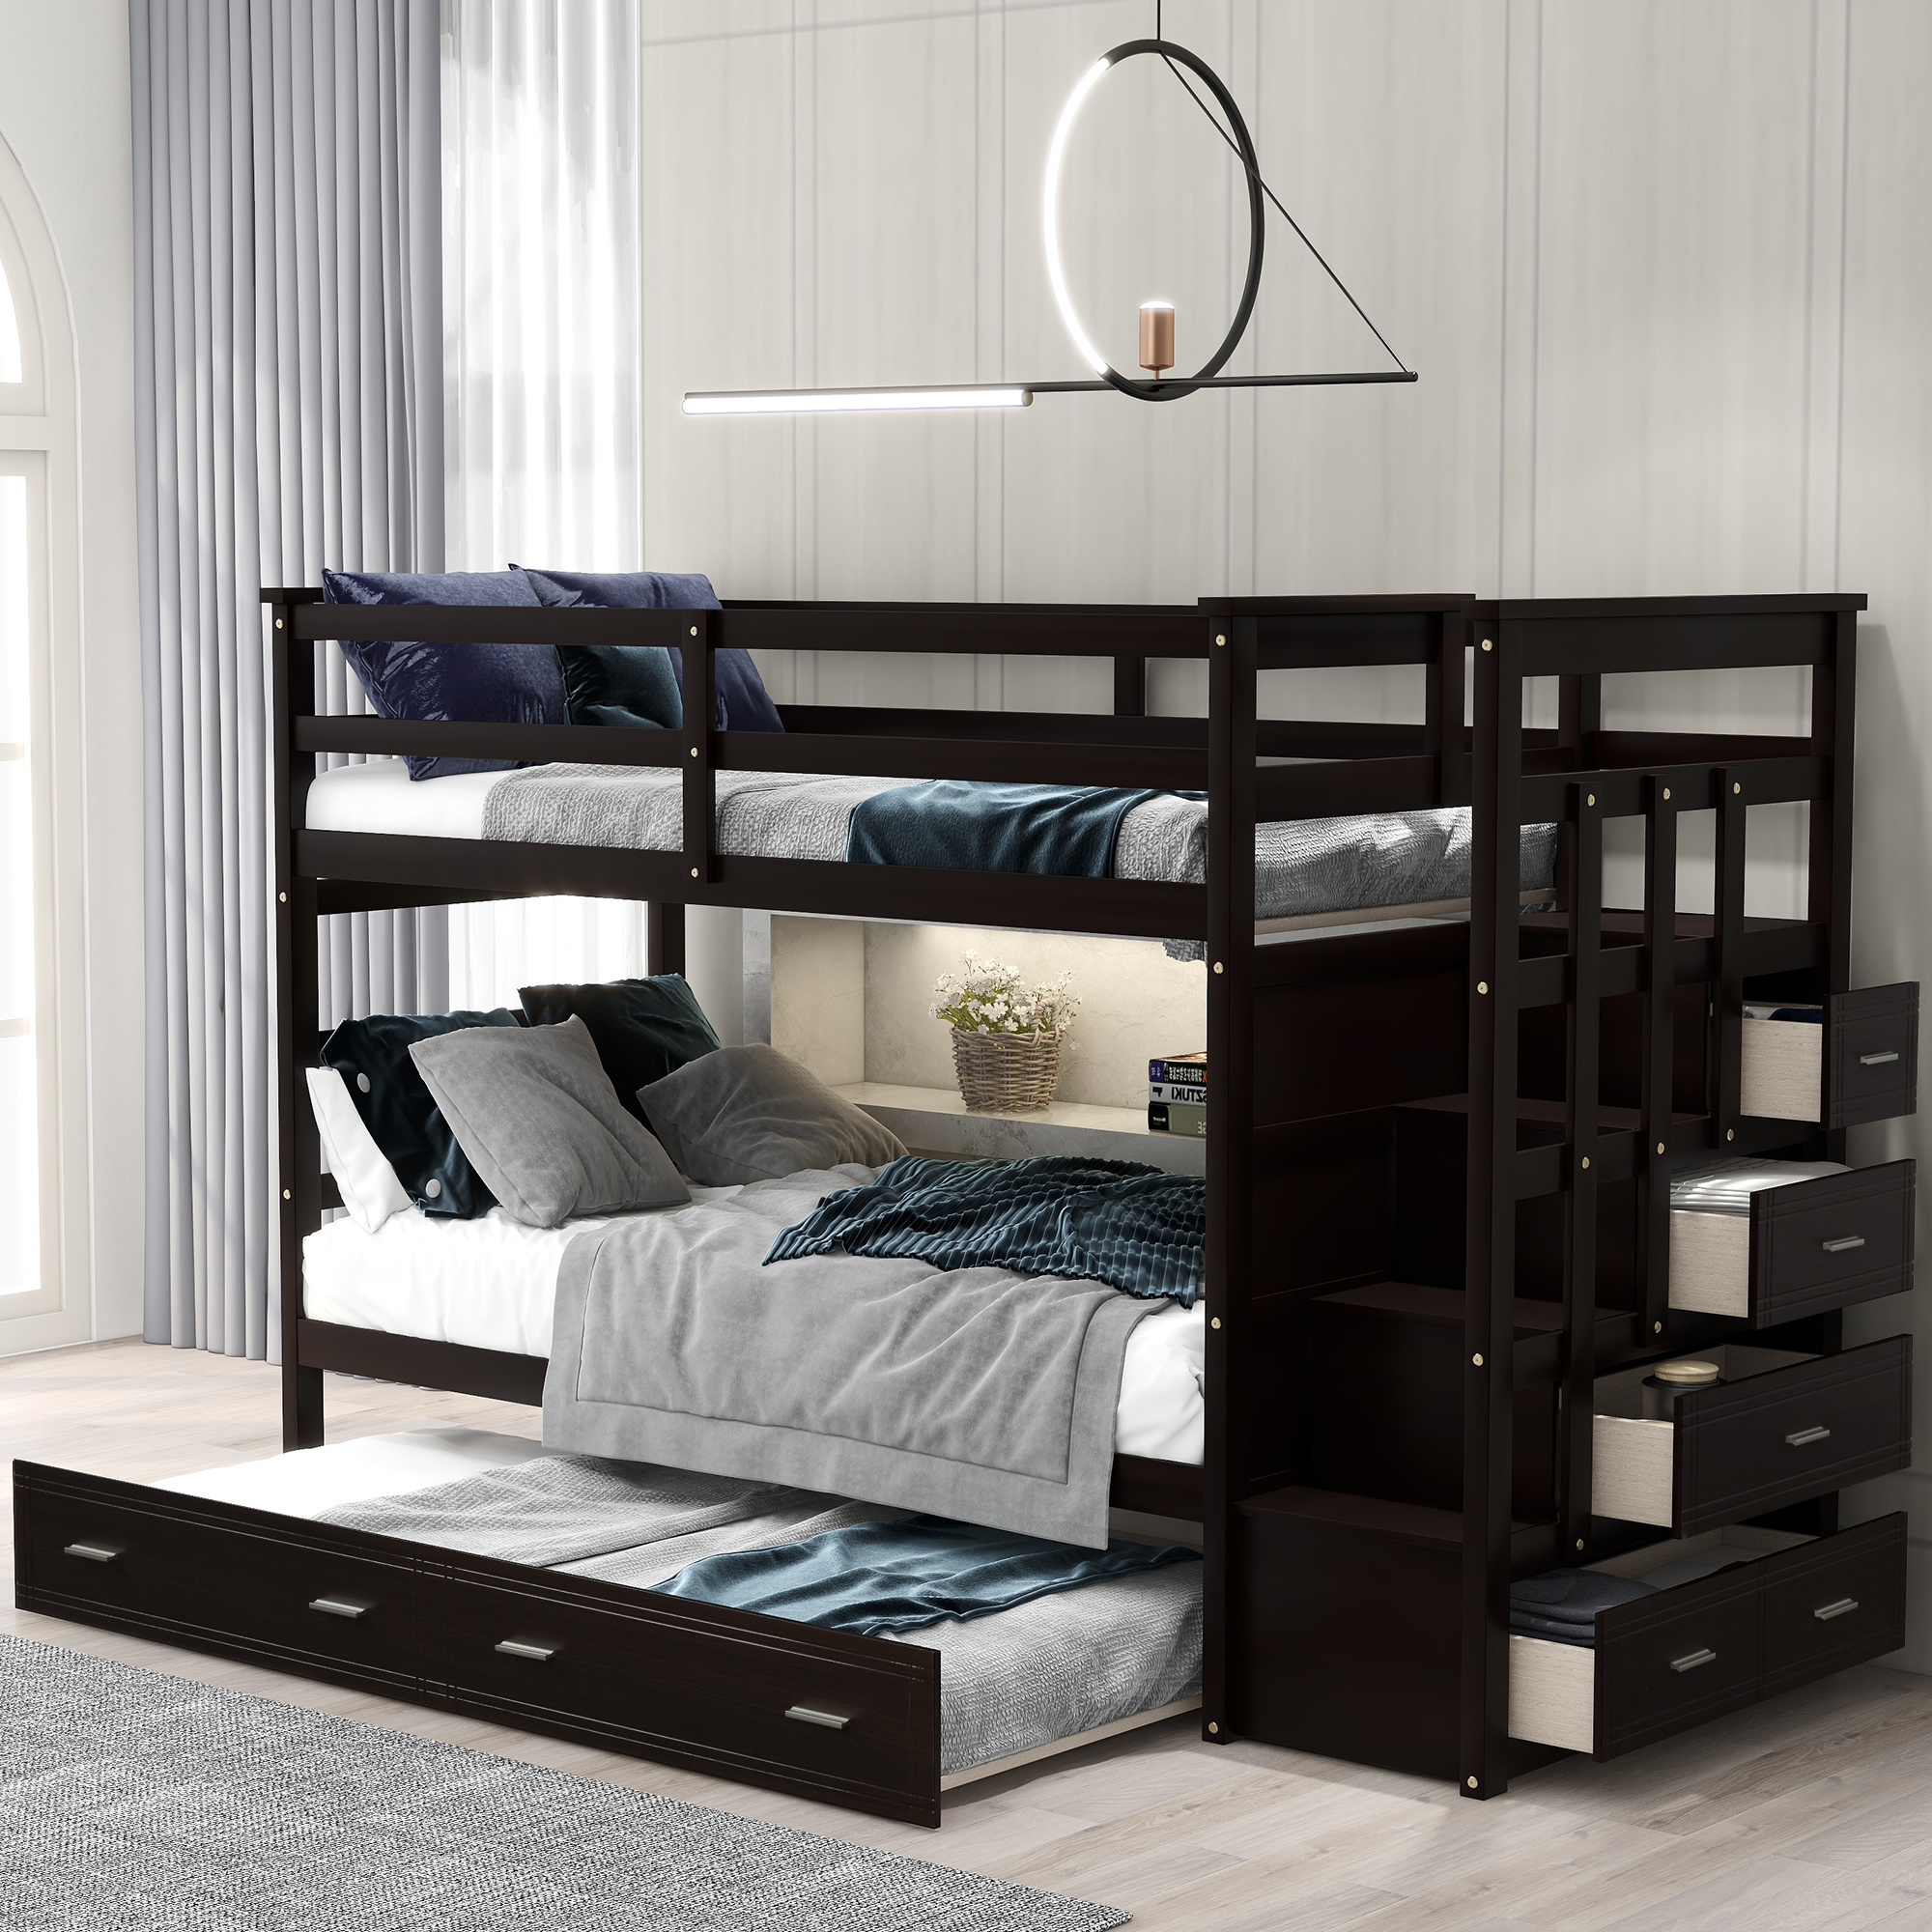 Euroco Twin Over Twin Bunk Bed With Trundle Storage Drawers Espresso Walmart Com Walmart Com